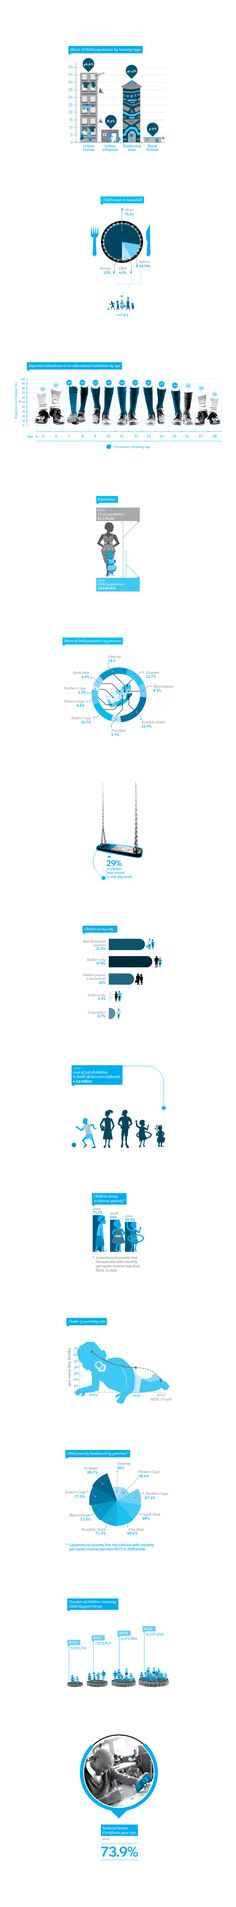 UNICEF Annual Report on Behance #Infographic #Unicef via @Lisa Phillips-Barton a Farme / Anne Boisen